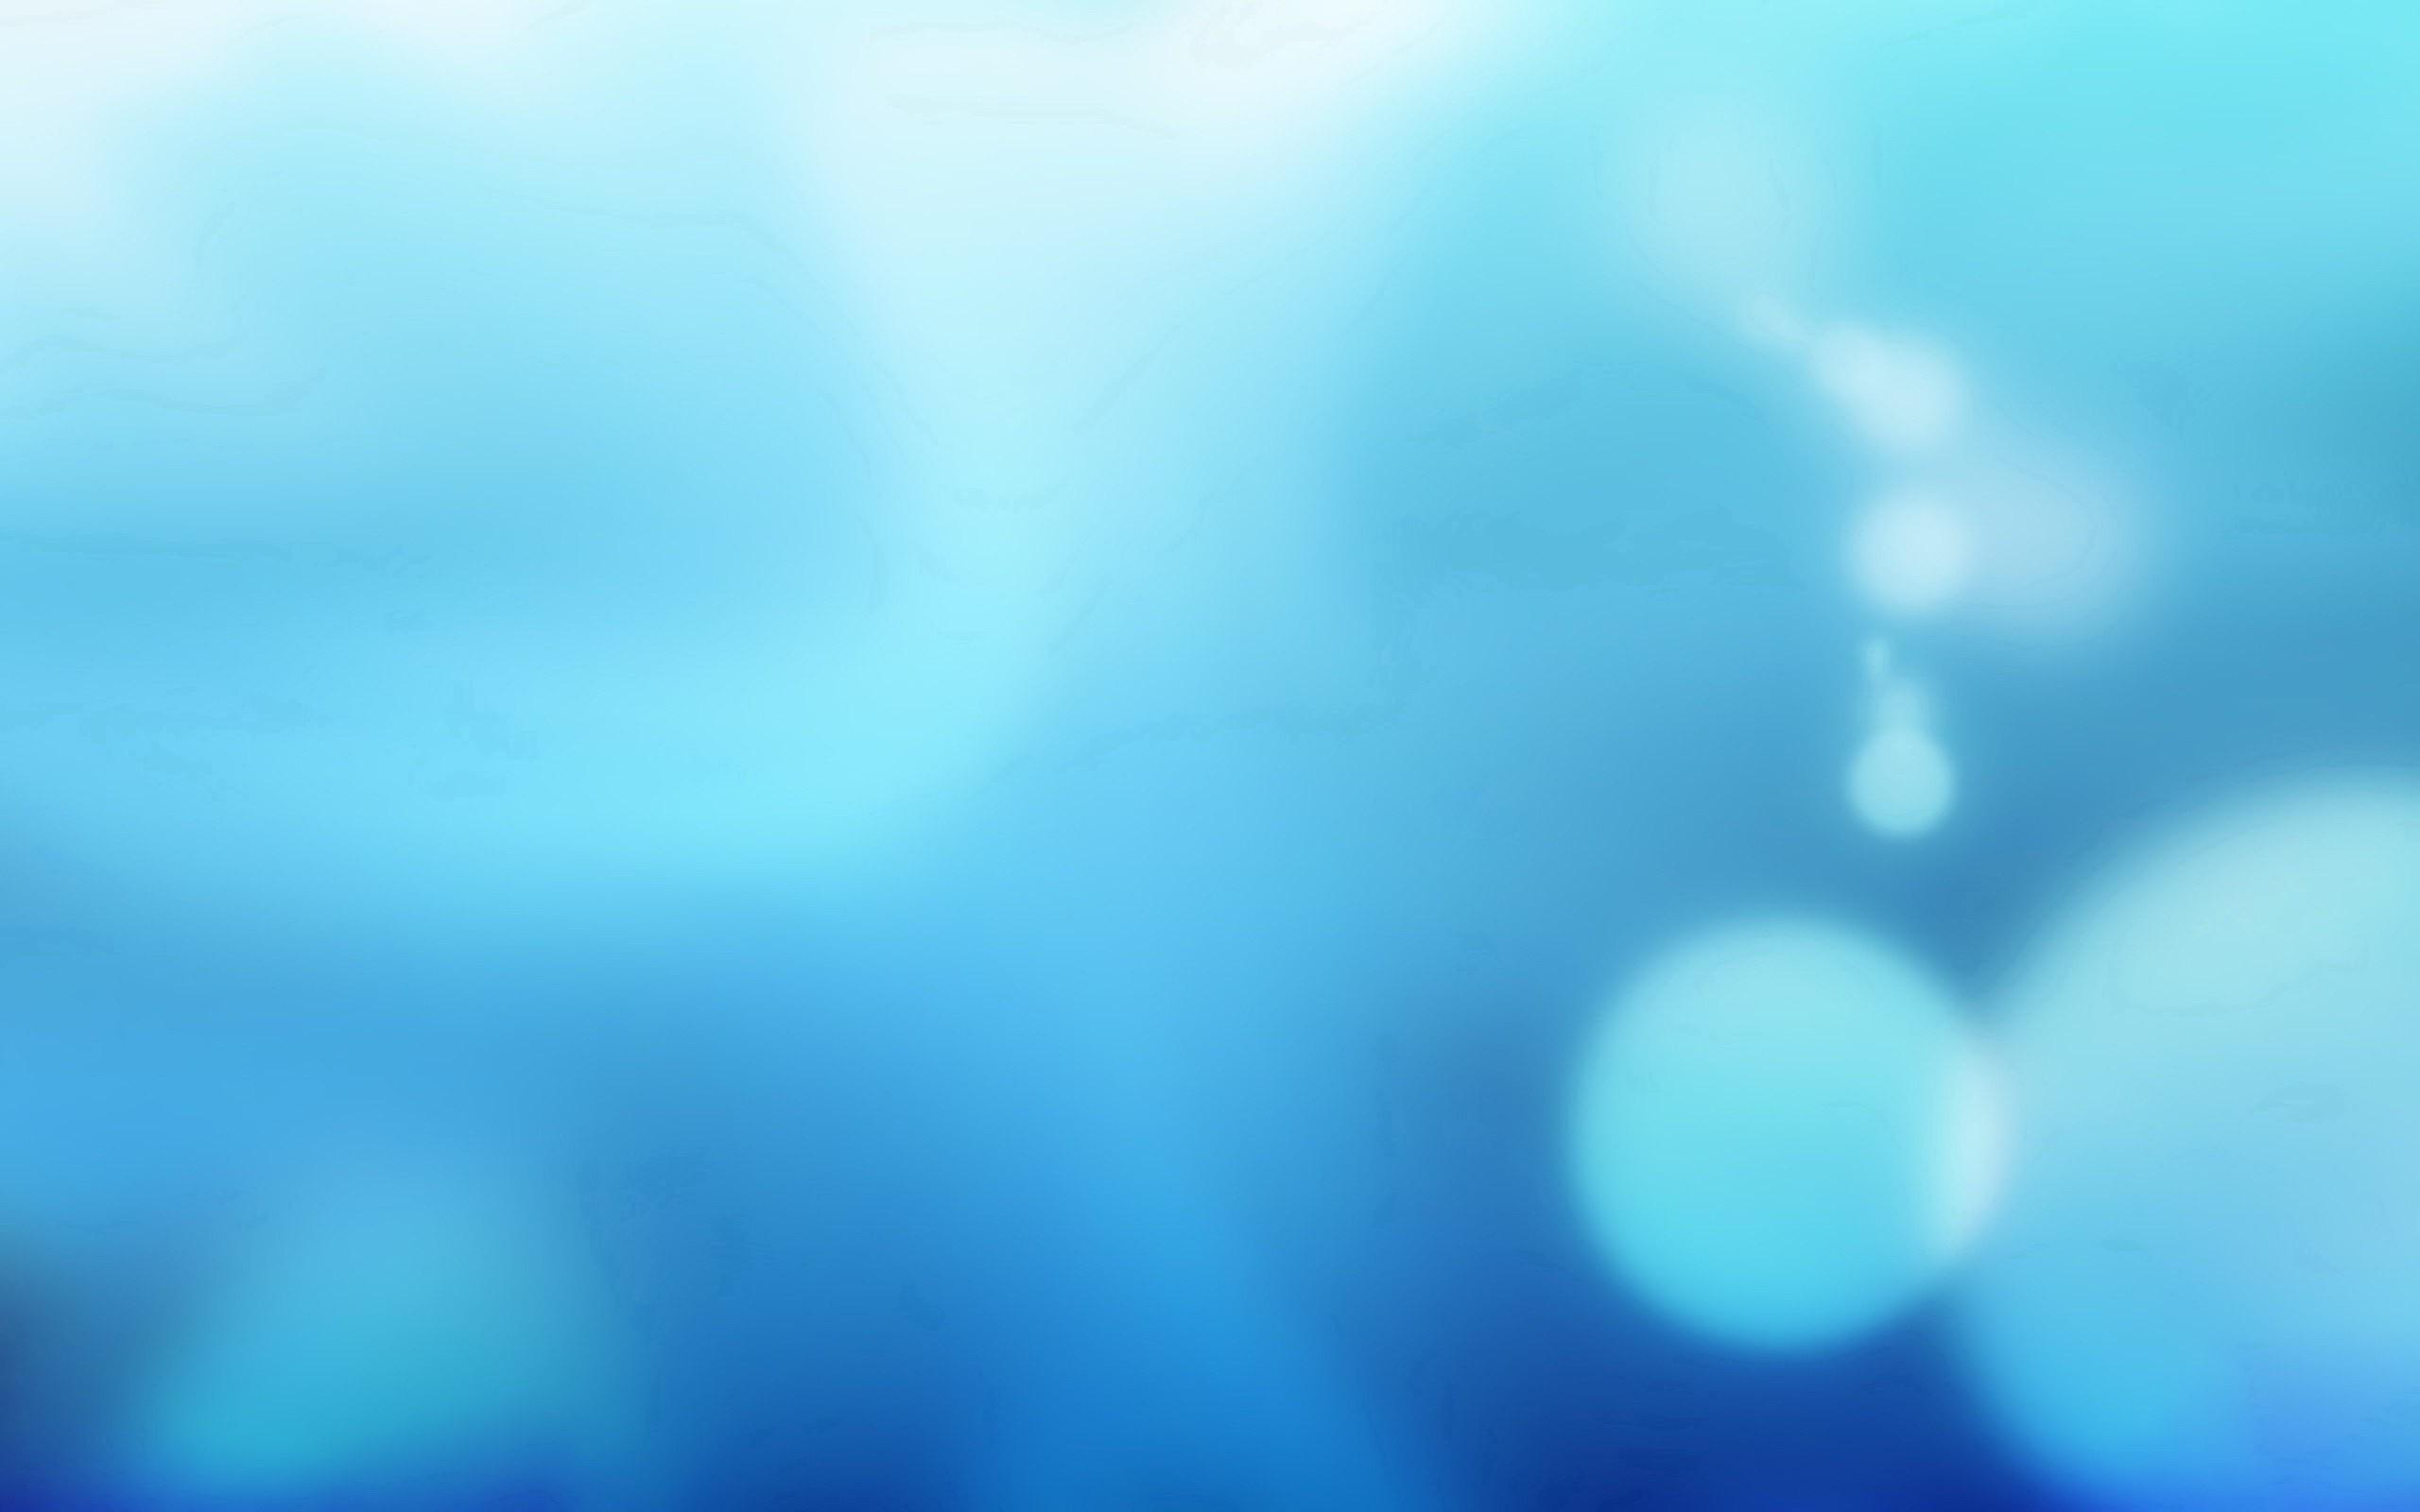 light blue background 31849